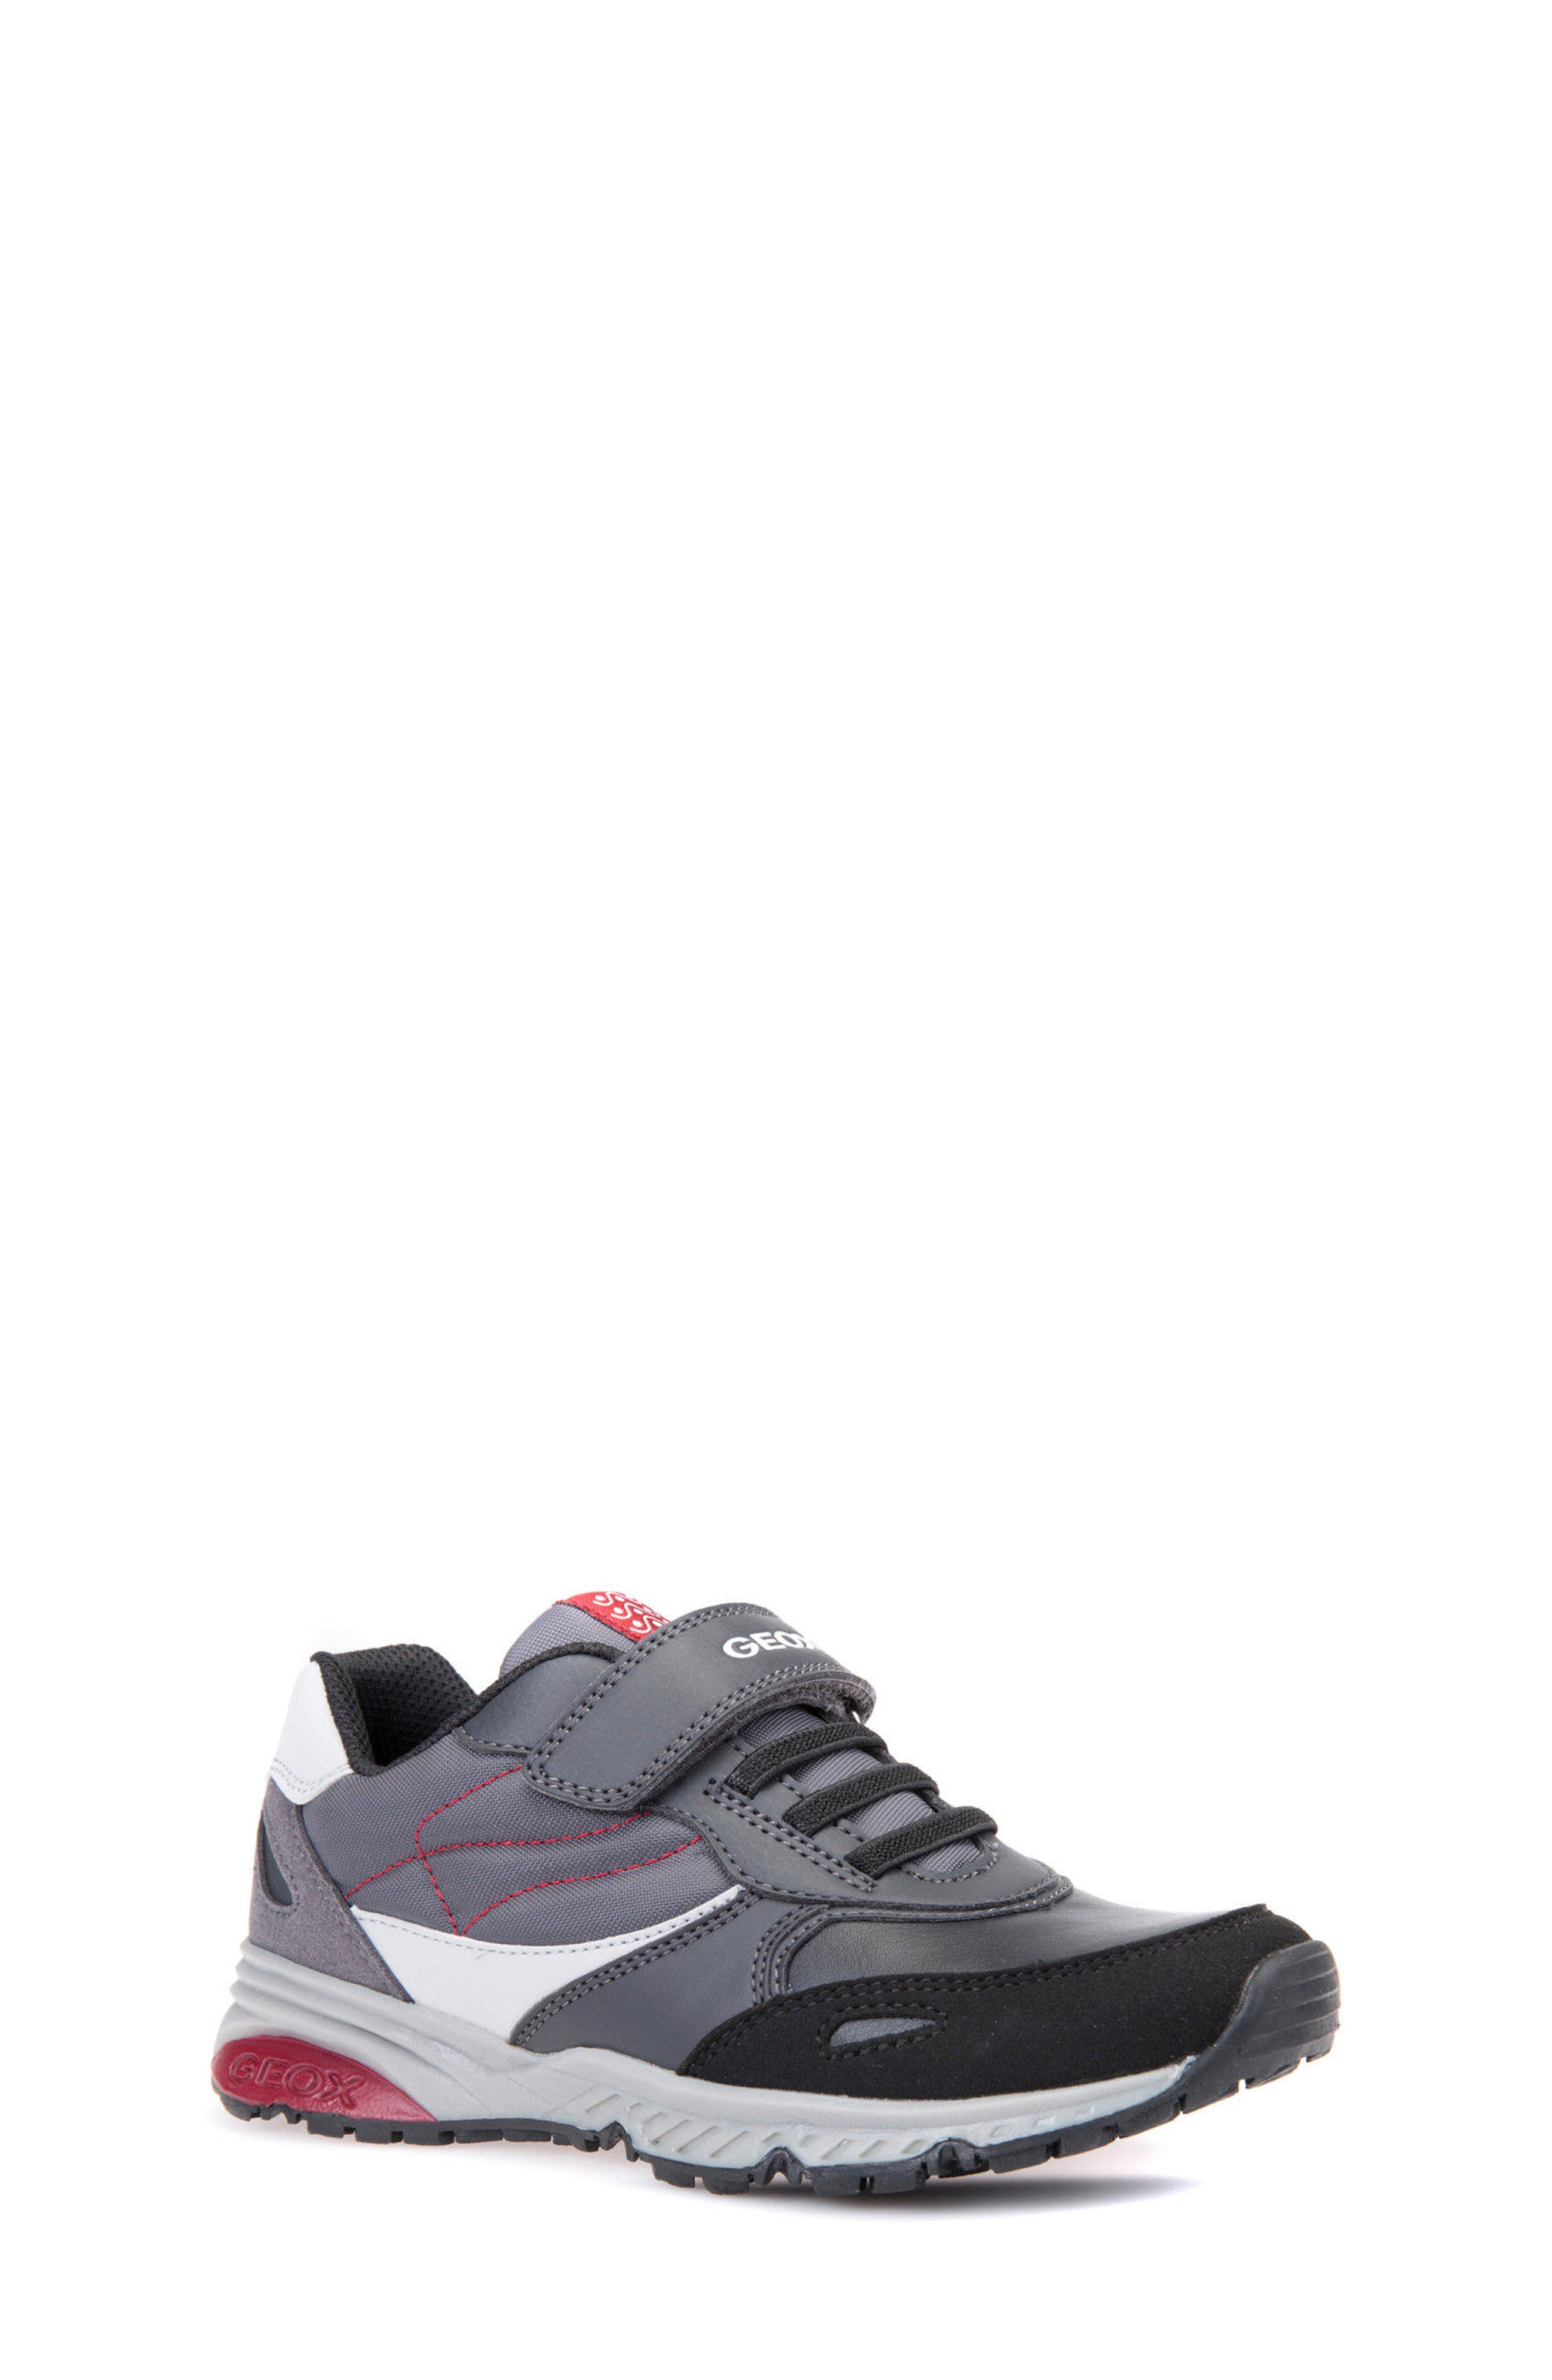 GEOX Jr Bernie Sneaker